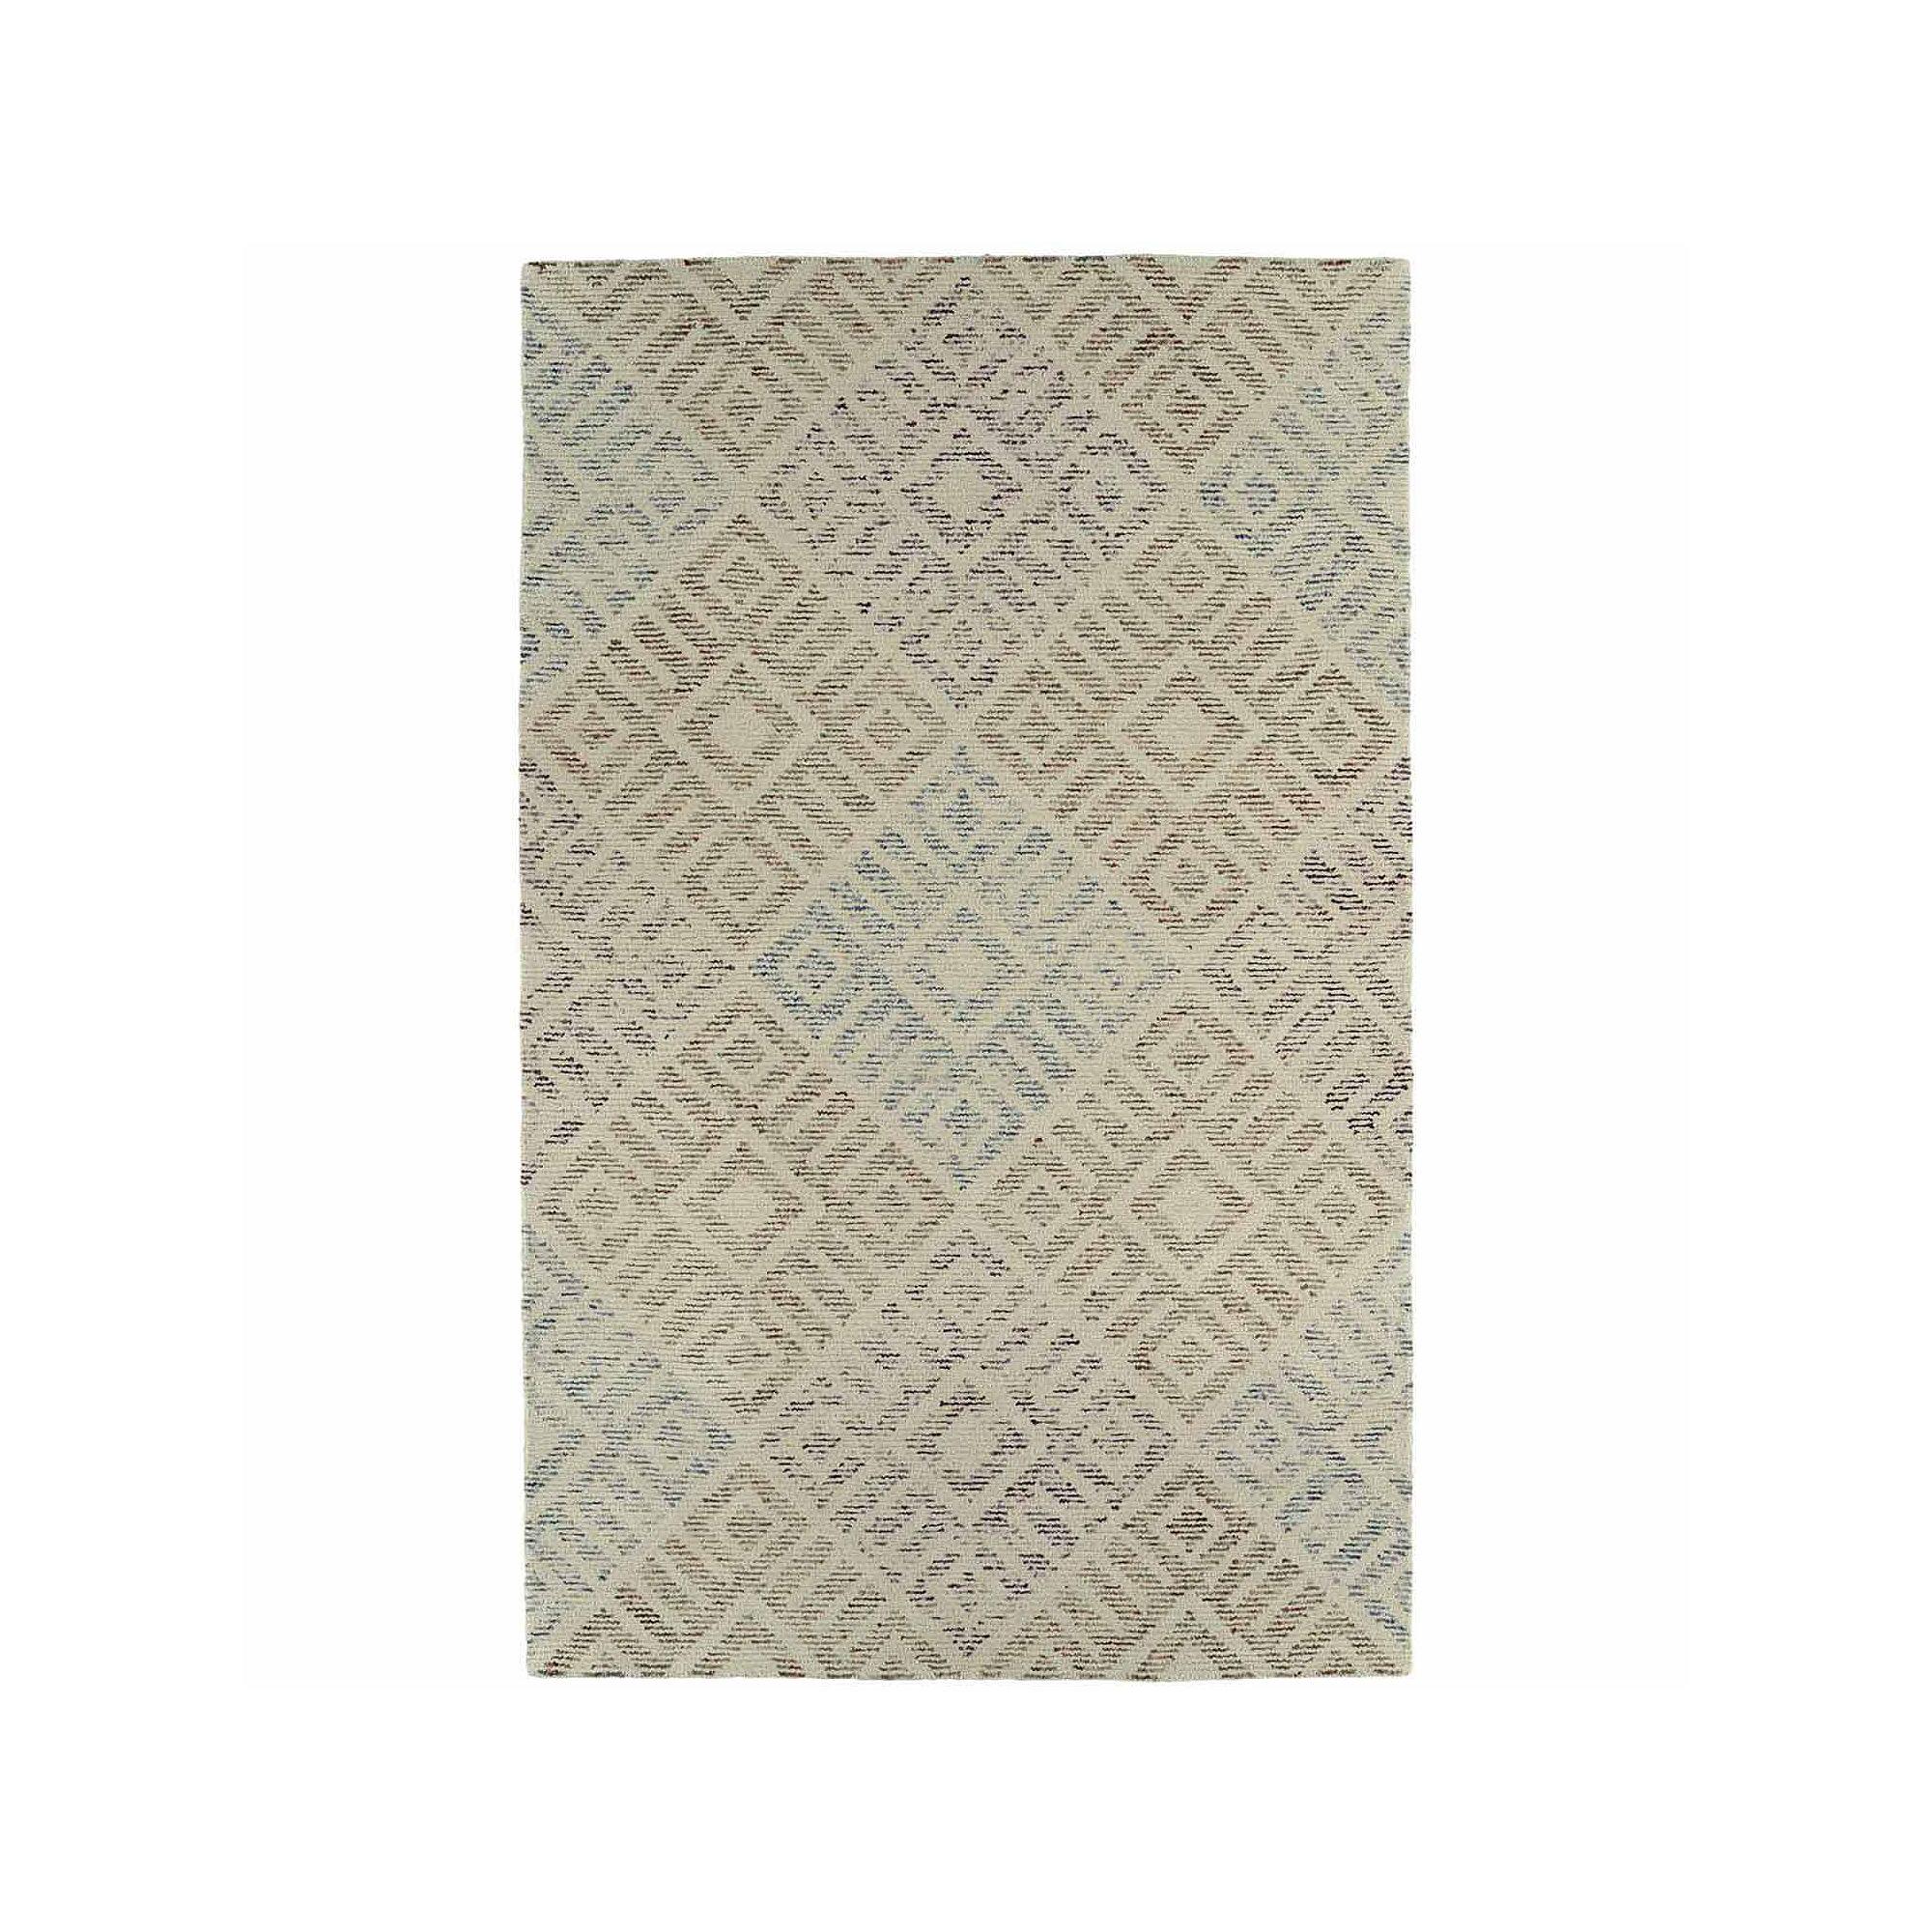 Kaleen Evanesce Geometric Rectangular Rug